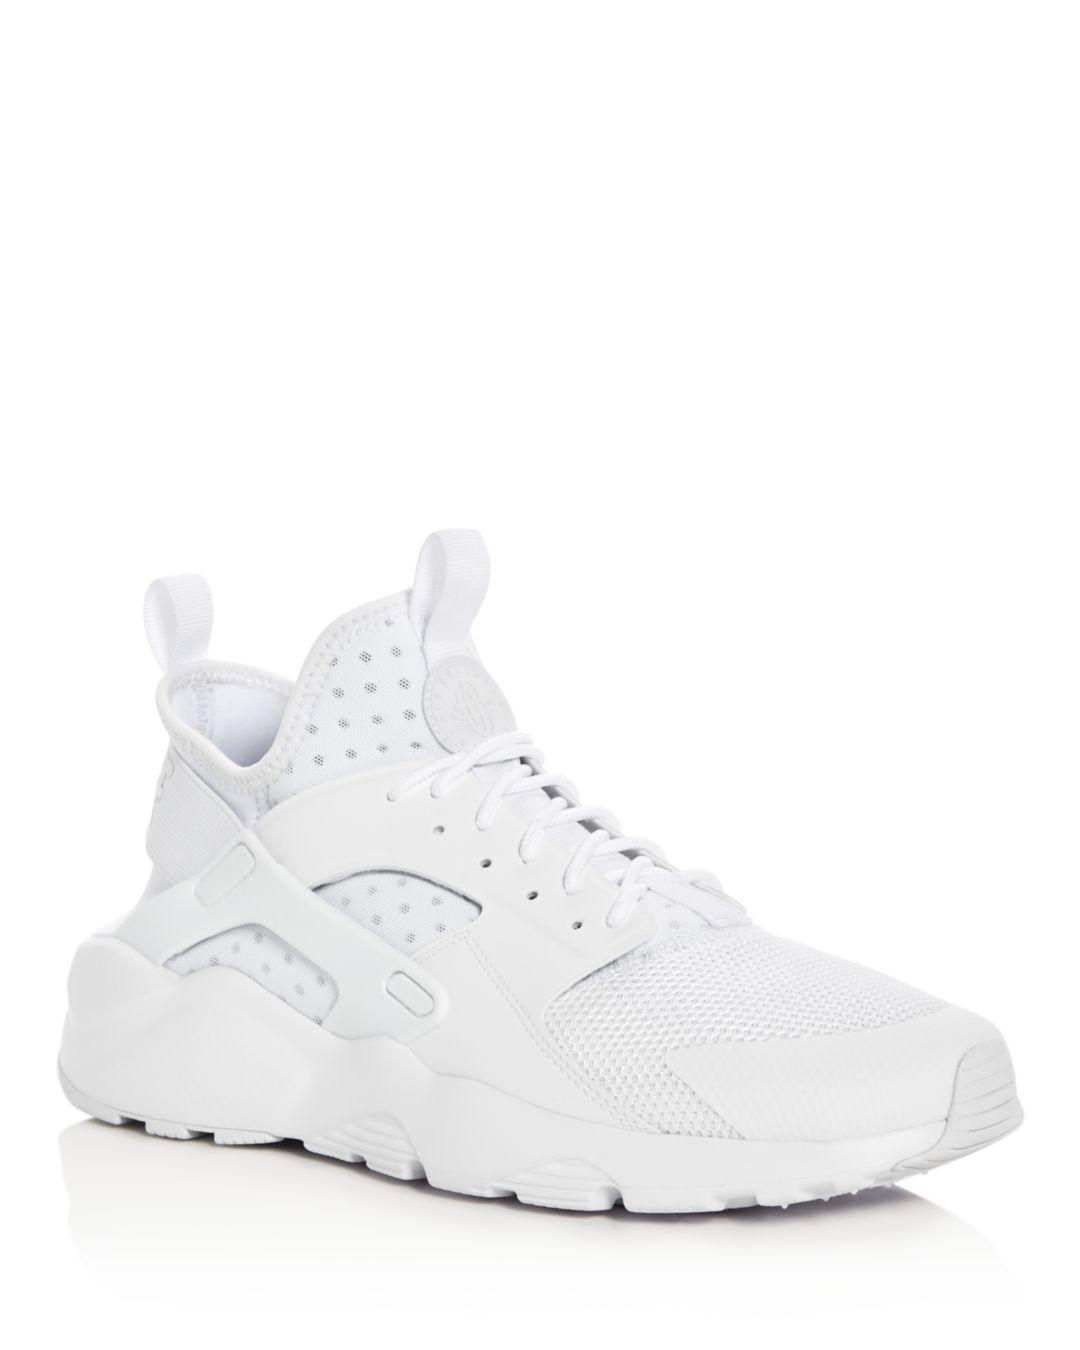 3e772d4d1bc0 Lyst - Nike Men s Air Huarache Run Ultra Lace Up Sneakers in White ...